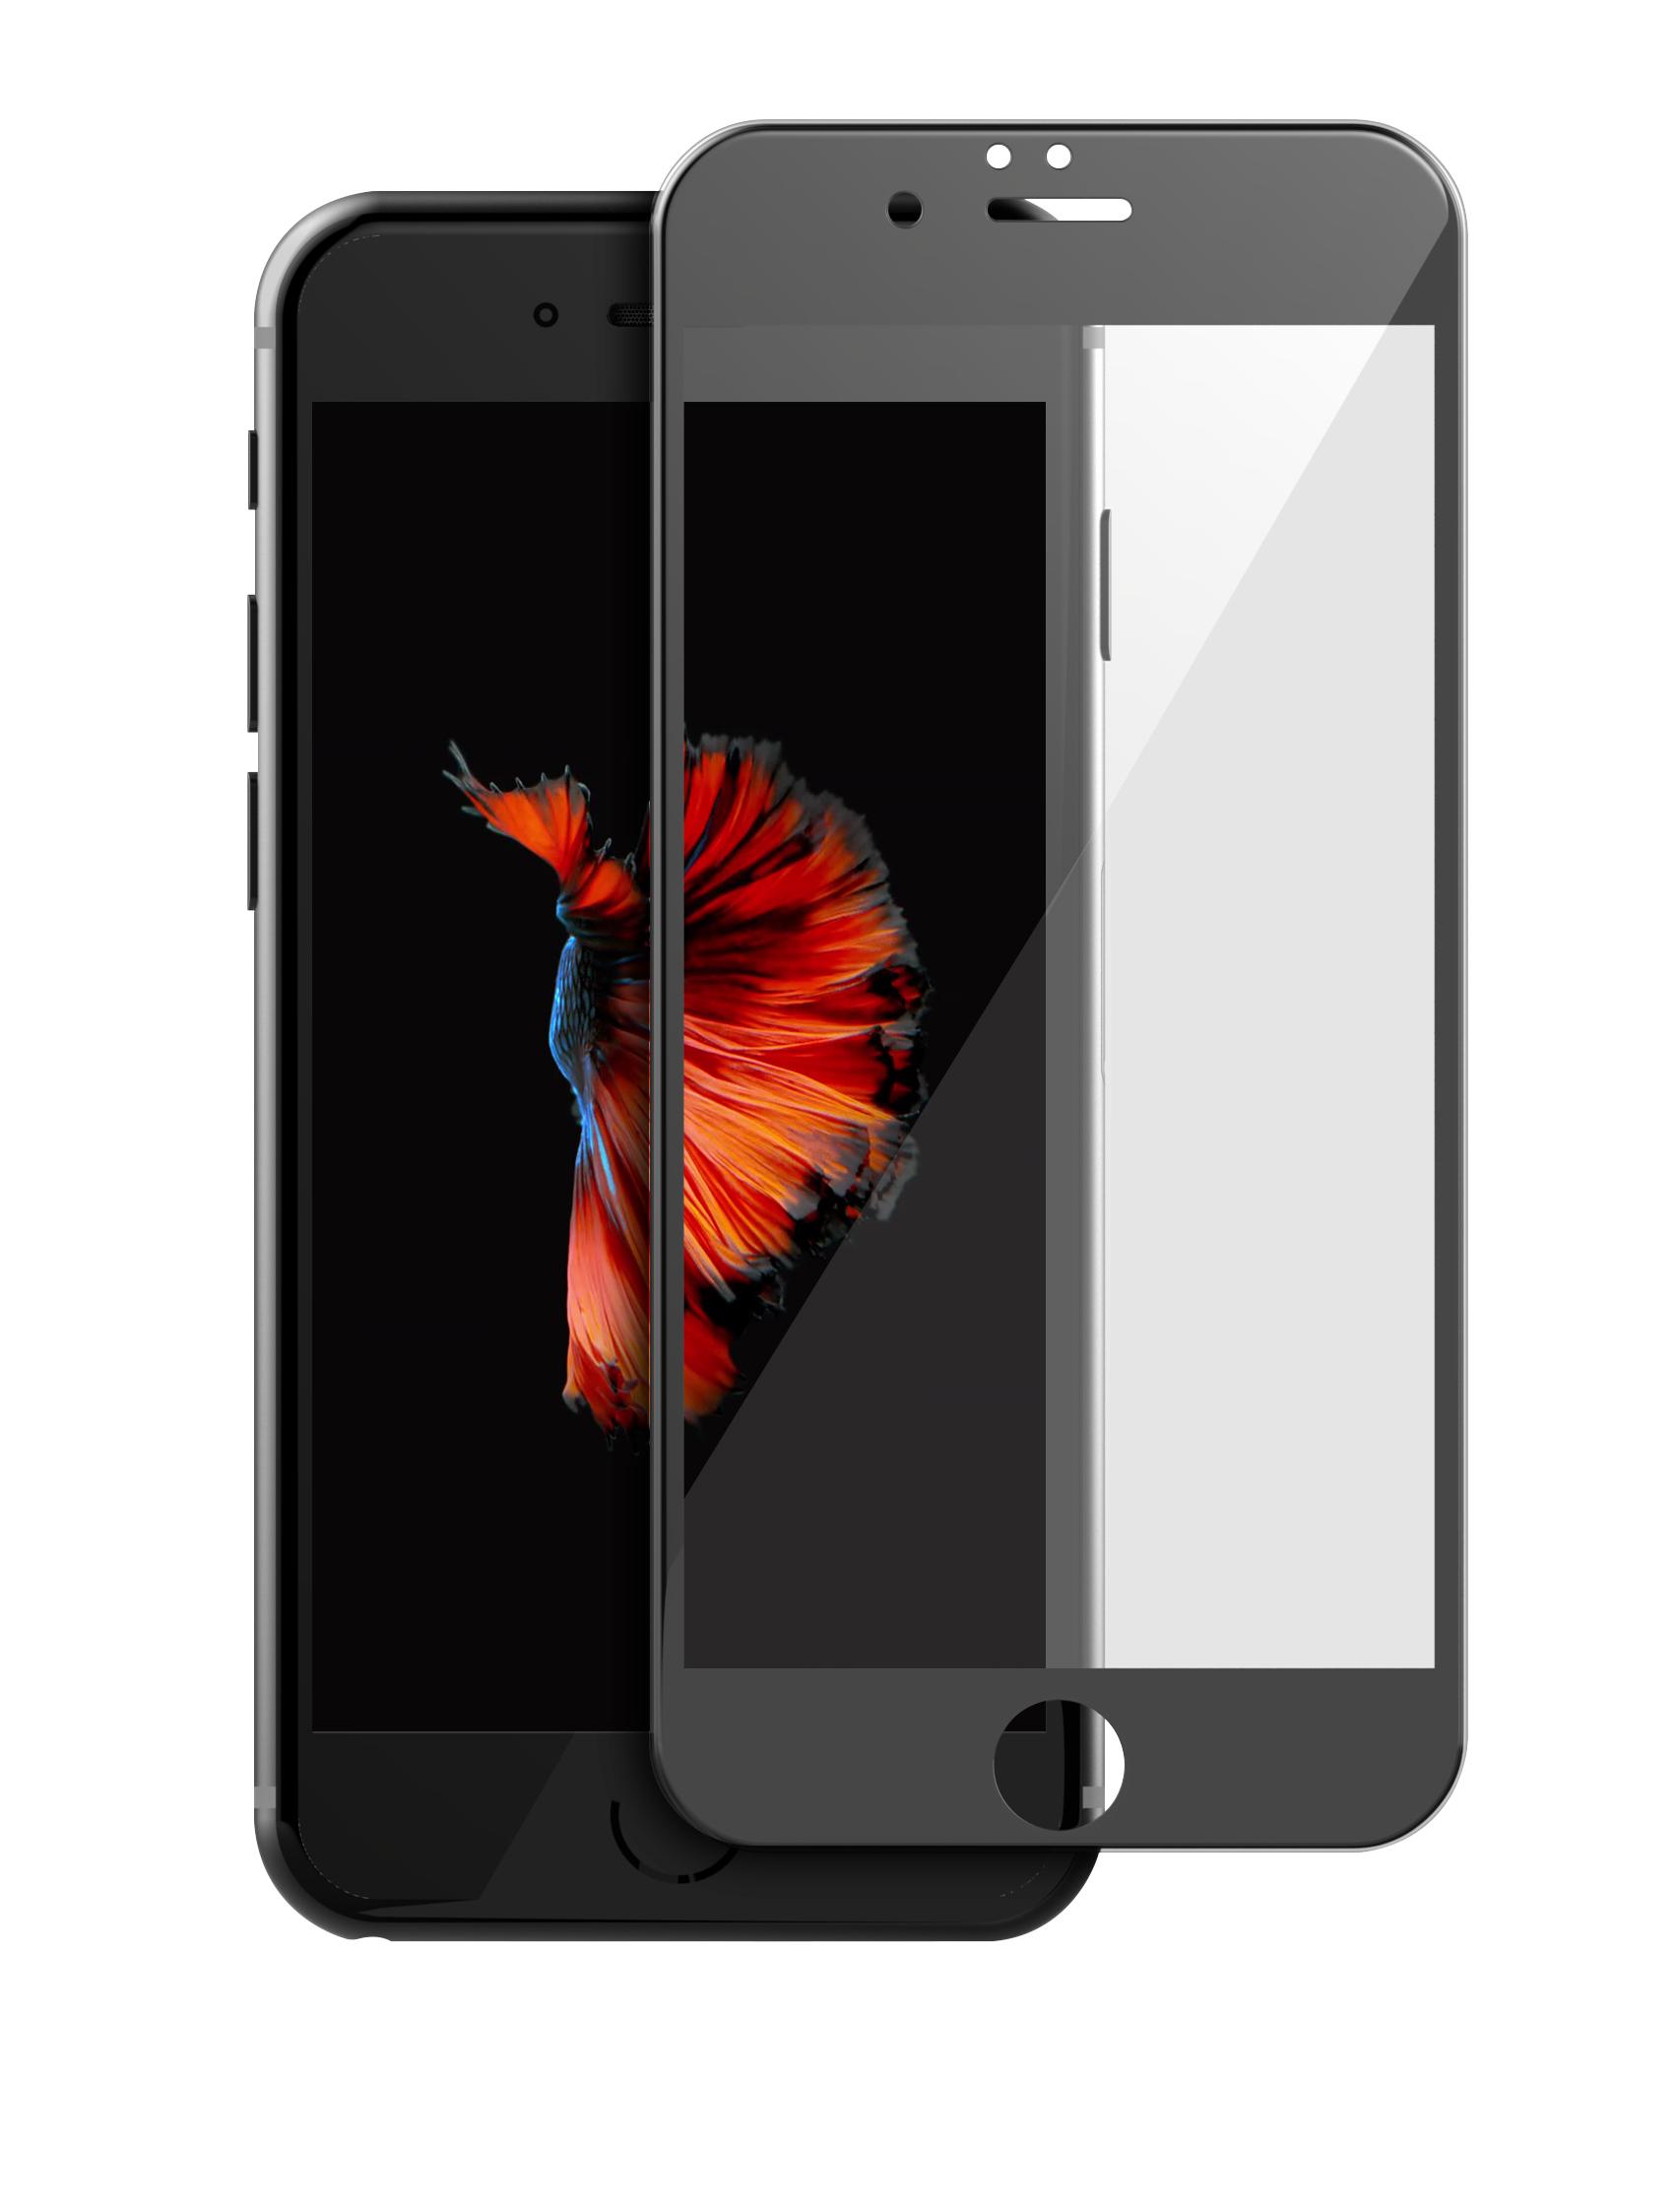 TEAMGROUP十銓科技 iPhone7PLUS 日本ASAHI旭硝子玻璃保護貼(Japan Asahi AGC Glass) 3D/9H (等同於康寧玻璃等級) 5.5吋黑色面板